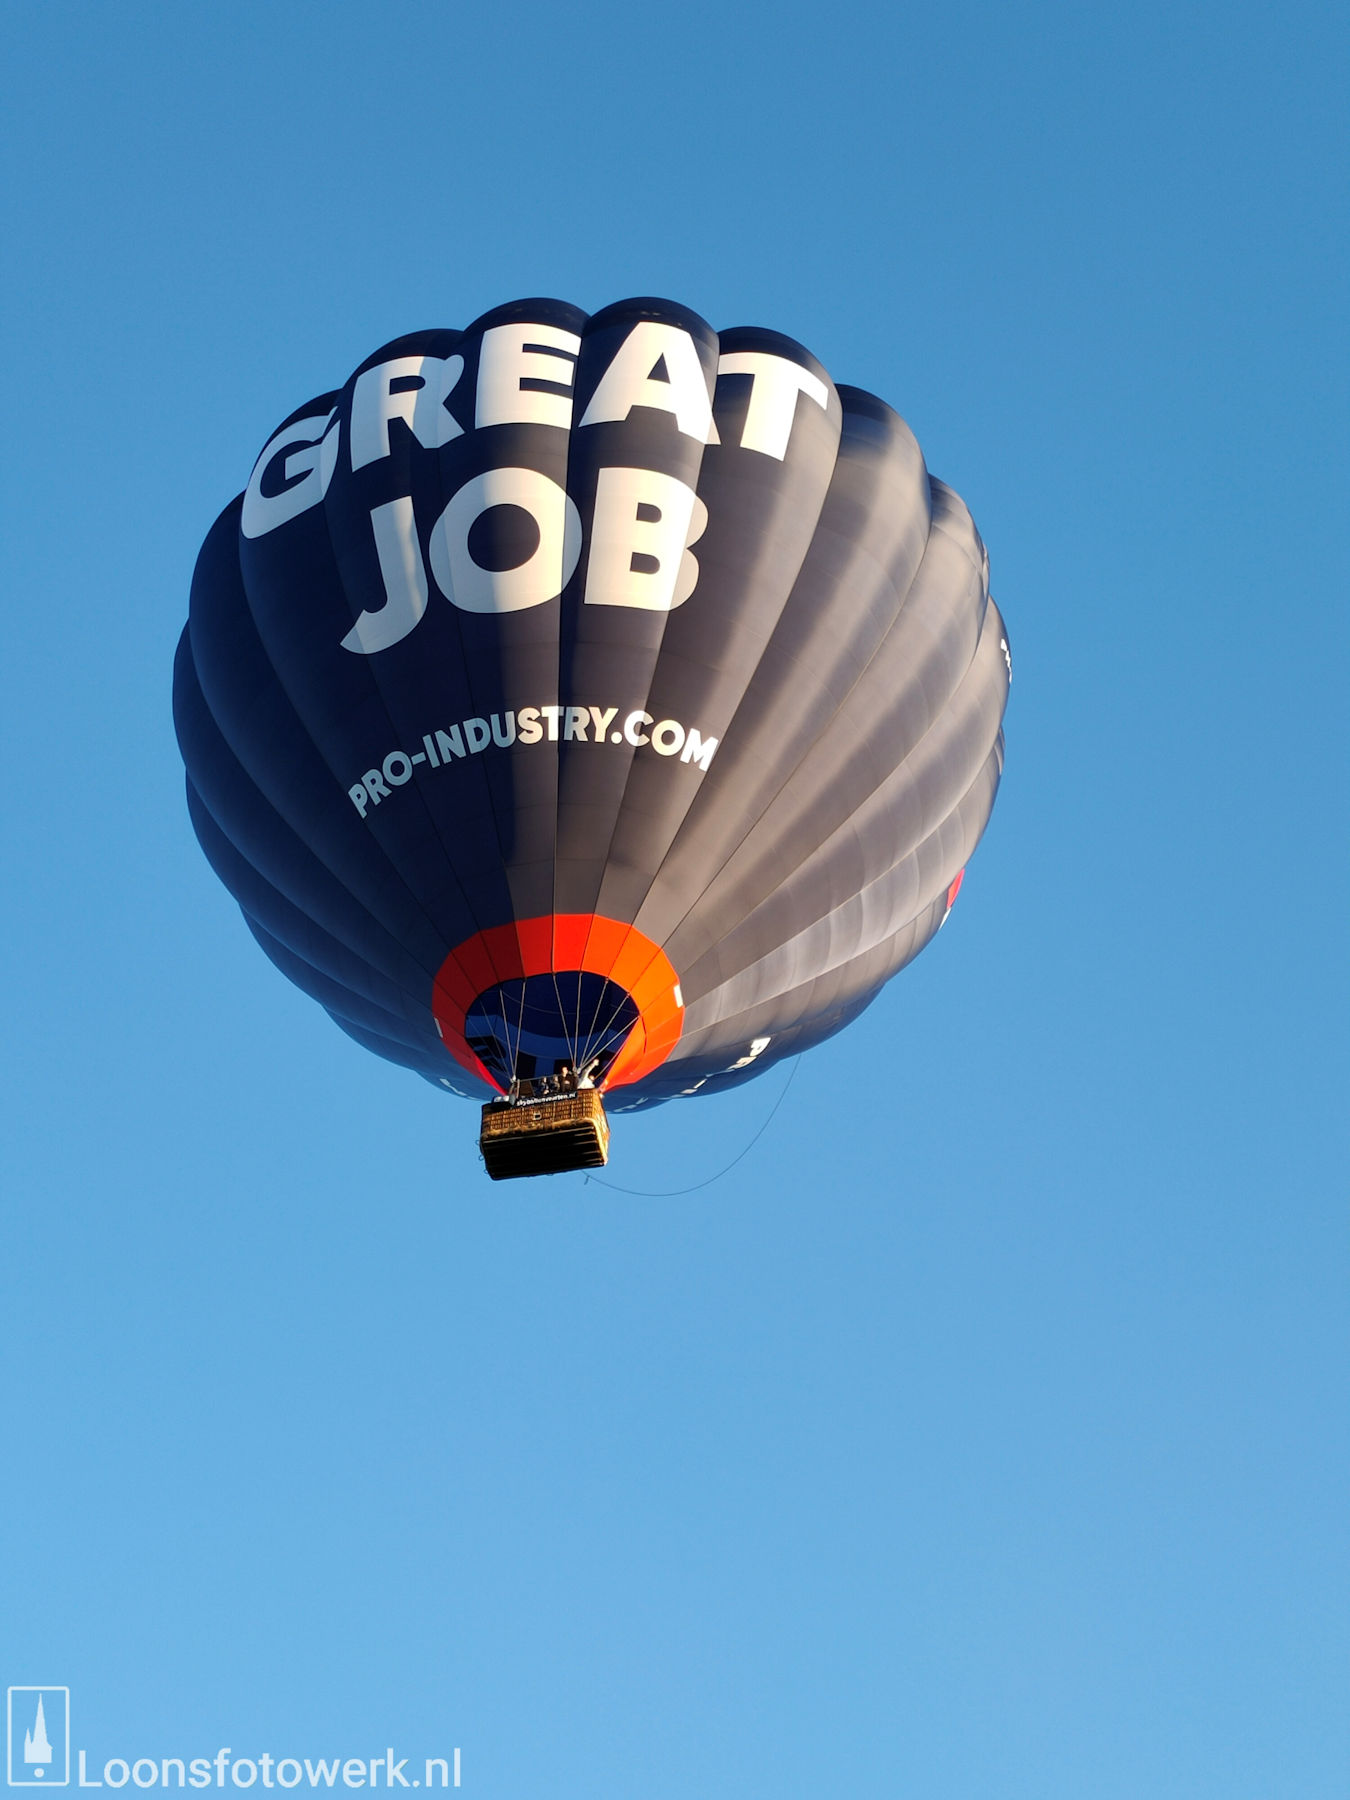 Ballonvaart vanaf de Kasteelweide 28